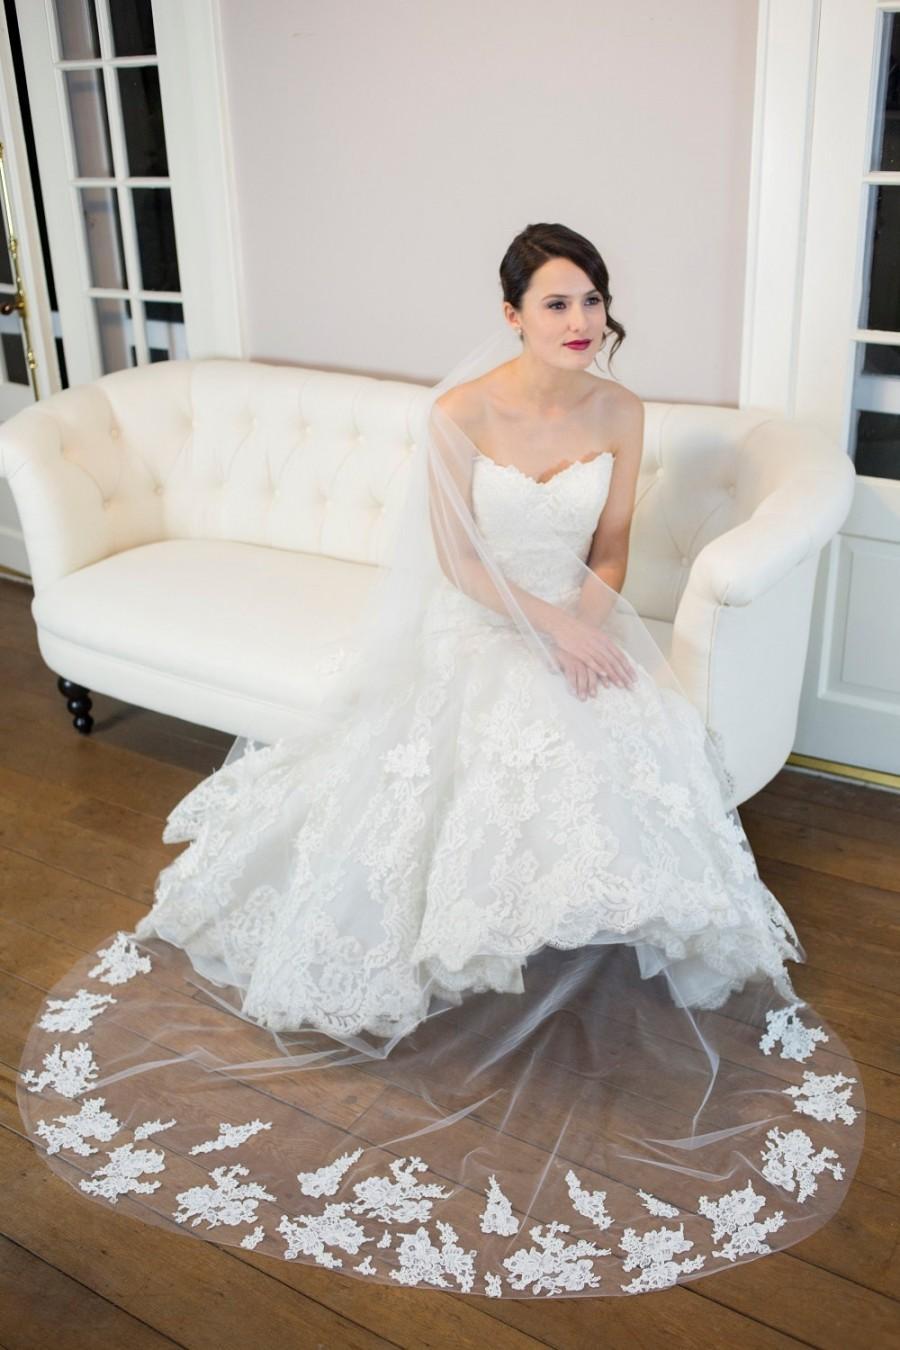 Свадьба - Wedding Veil - Drop Veil, Cathedral Veil, Chapel Veil, Floor Veil with French Alencon Lace Appliques